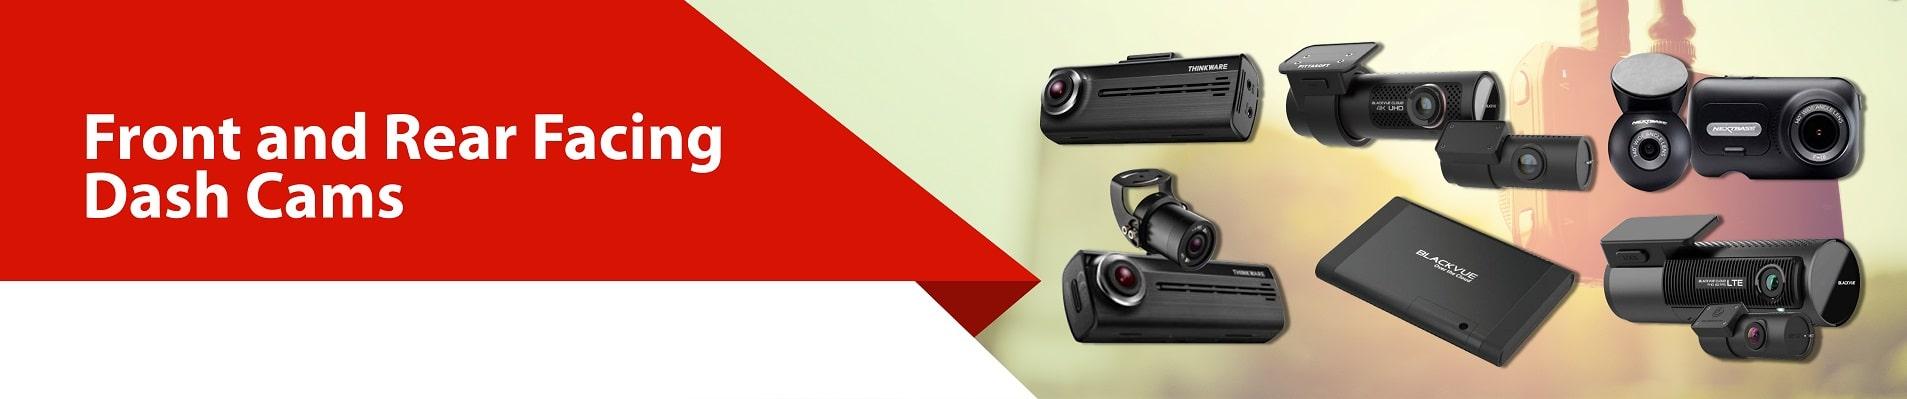 Front and rear facing dash cams